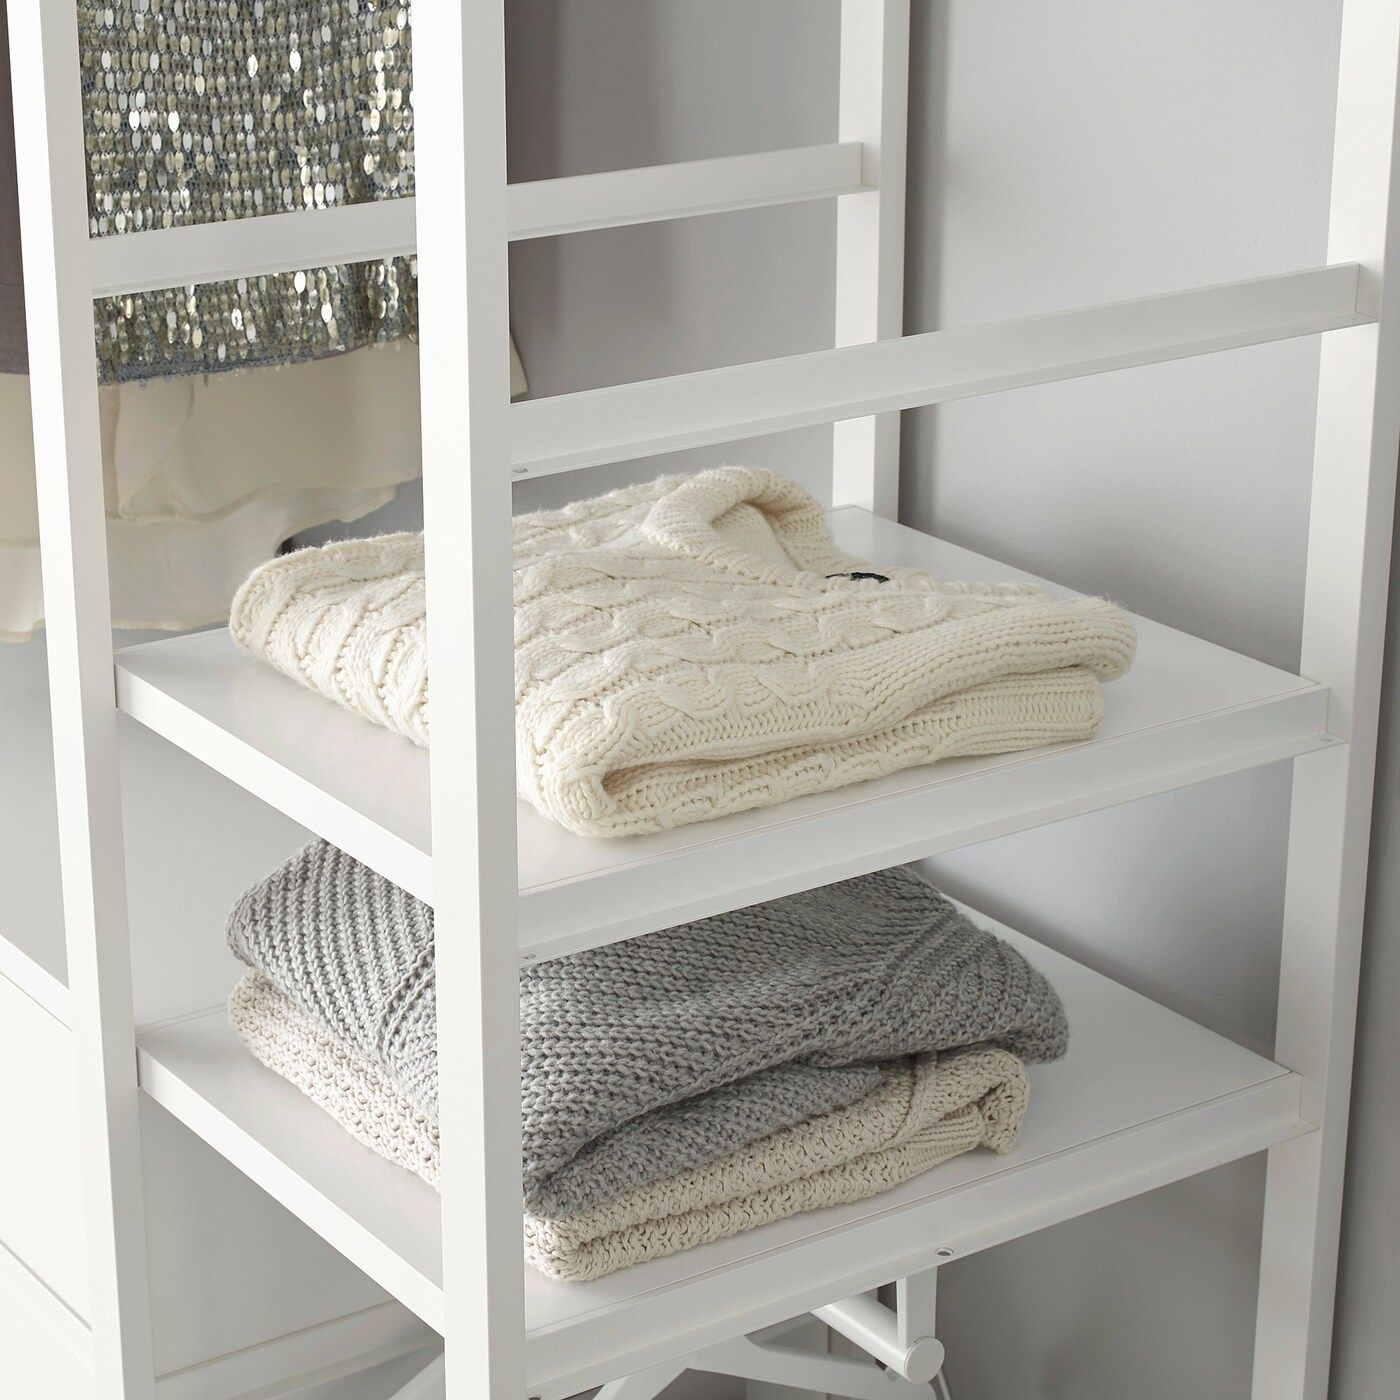 IKEA ELVARLI Side unit white in 2020 Ikea, Shelves